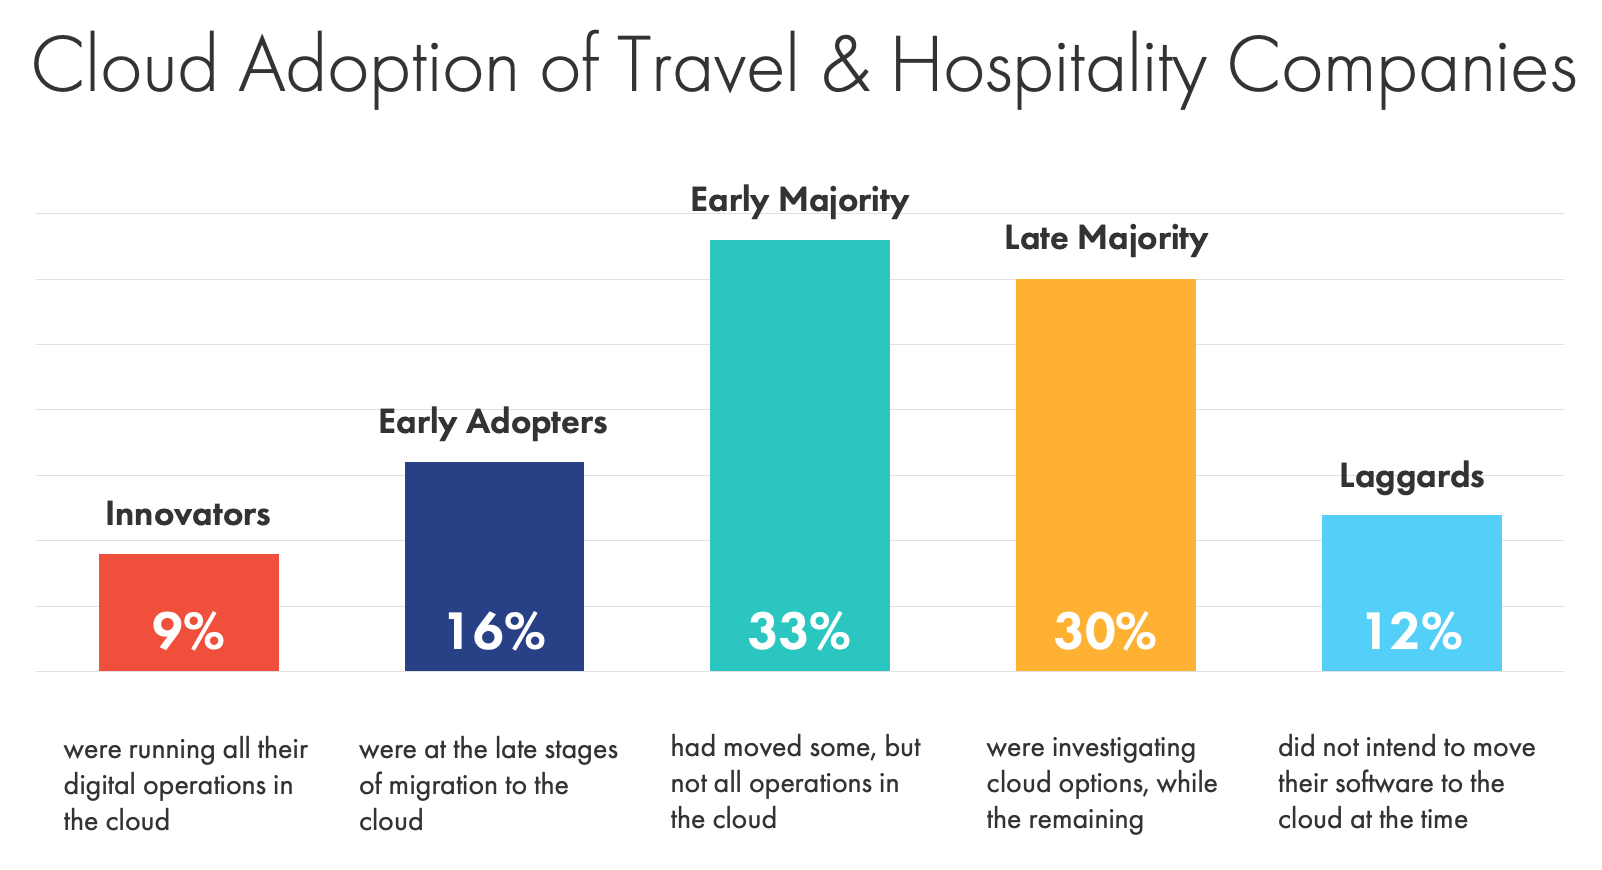 Cloud Adoption Levels of Travel & Hospitality Companies